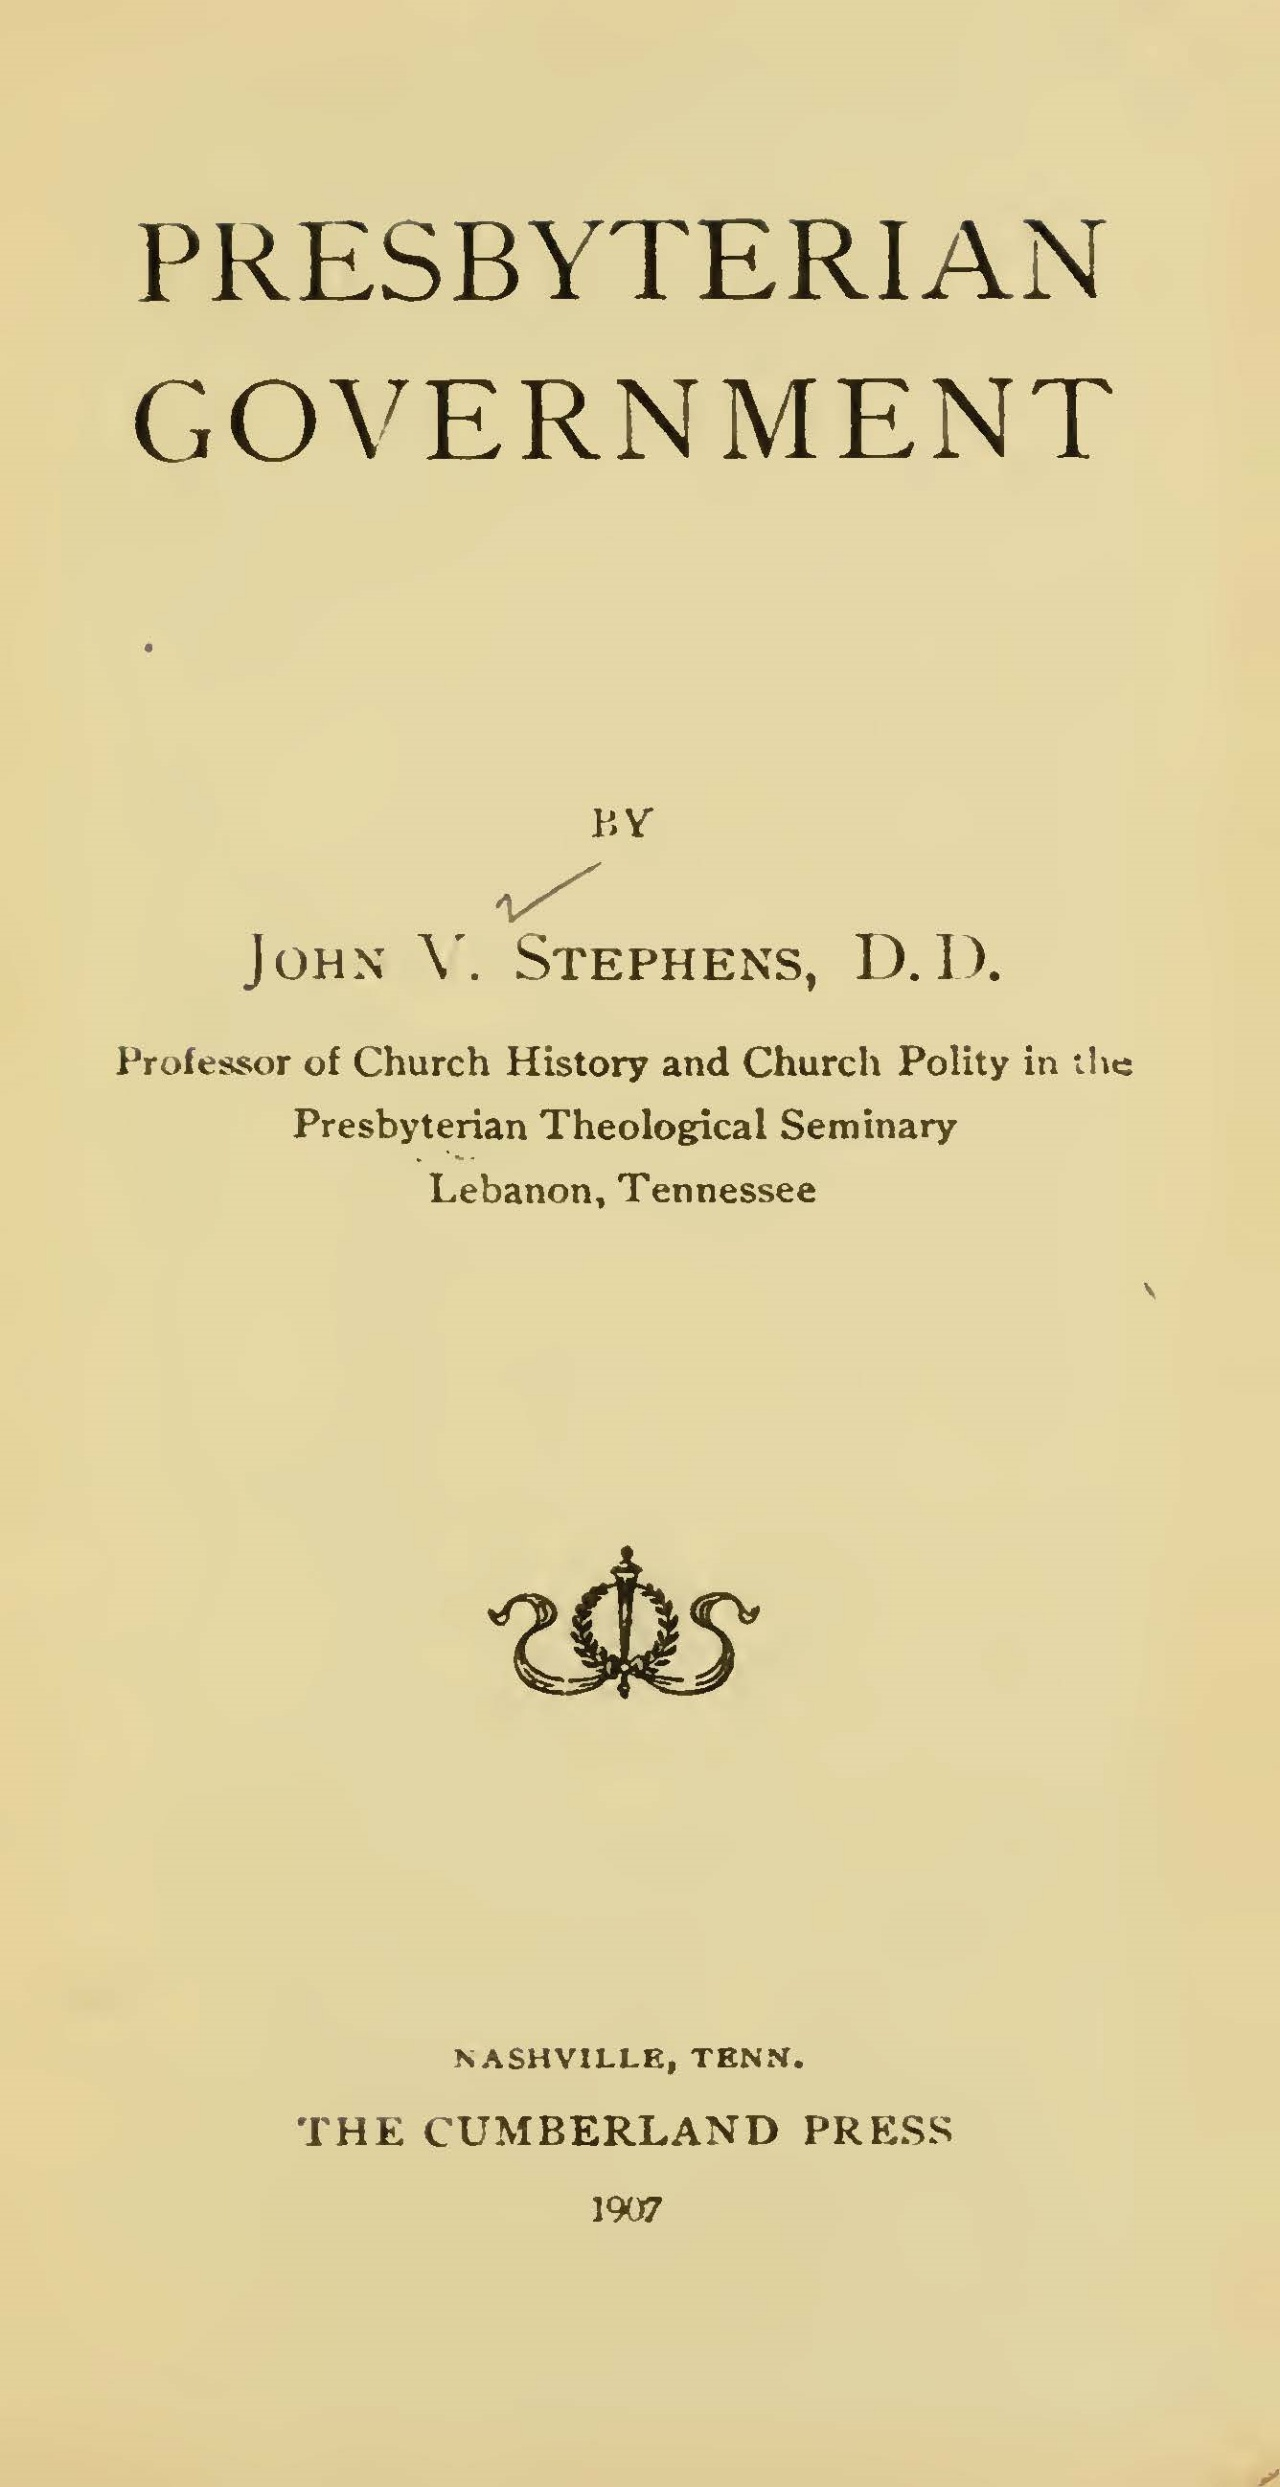 Vant Stephens, Sr., John, Presbyterian Government Title Page.jpg